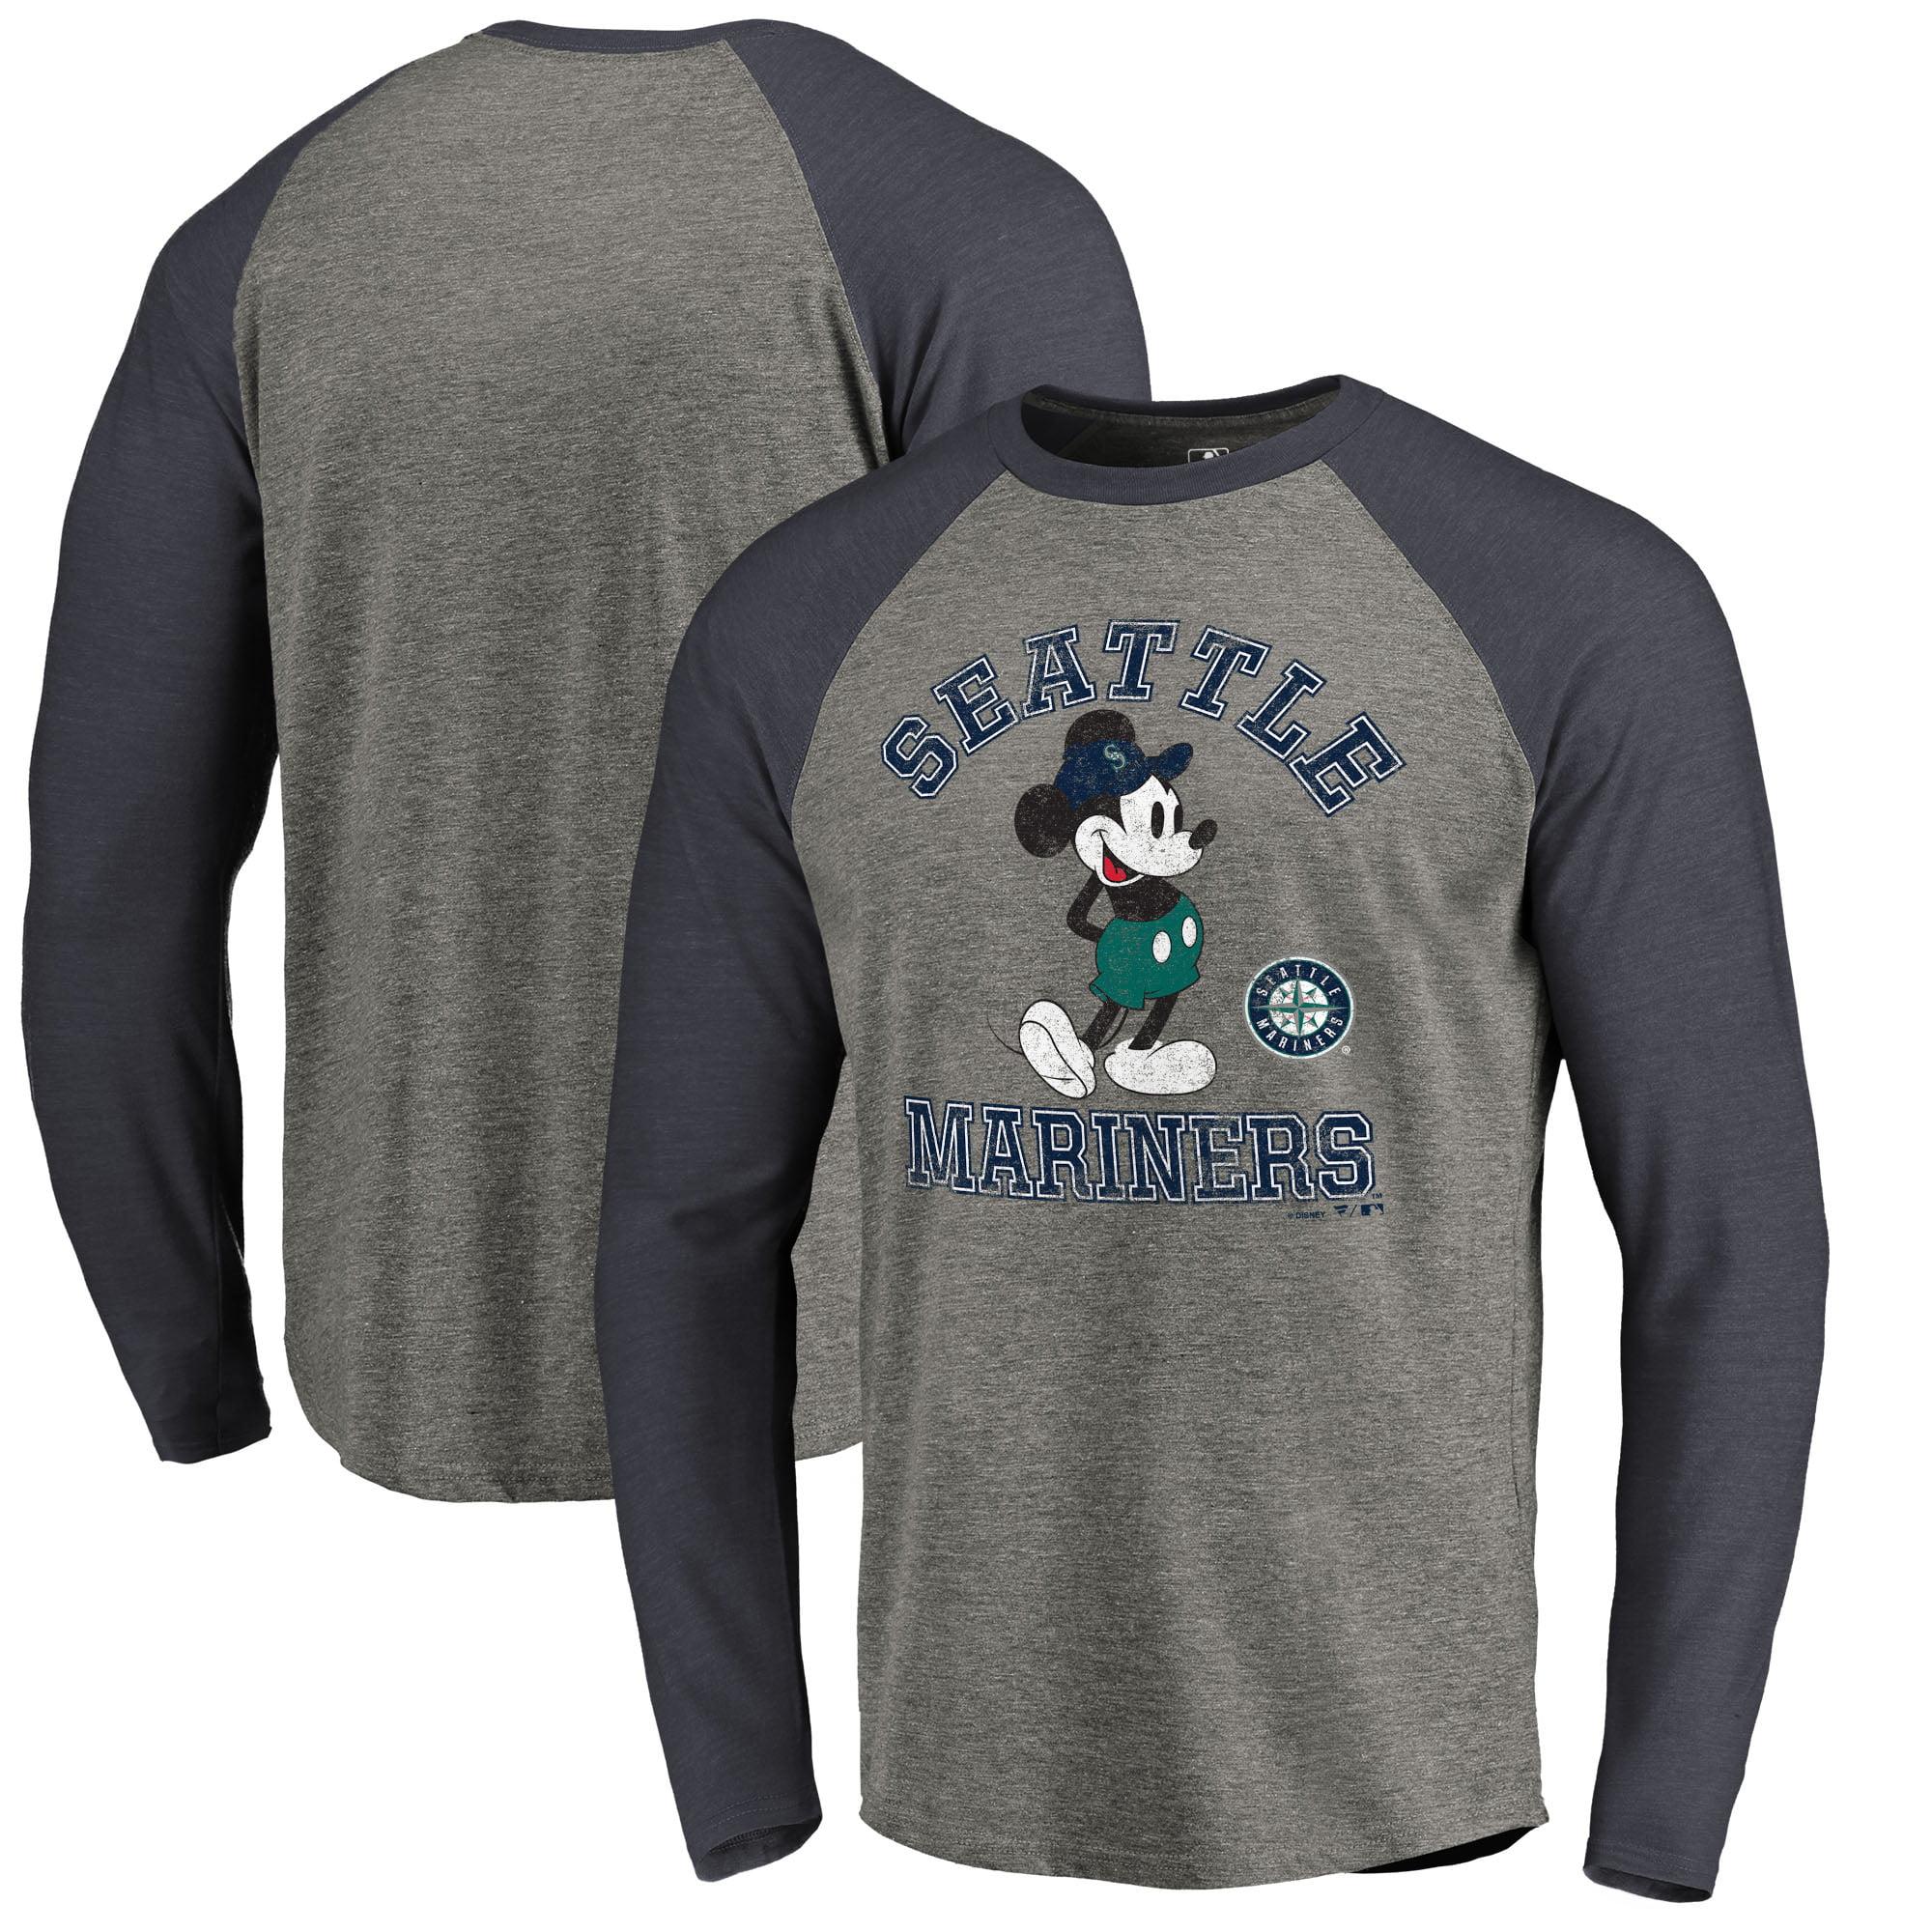 Seattle Mariners Fanatics Branded Disney MLB Tradition Long Sleeve Tri-Blend T-Shirt - Heathered Gray